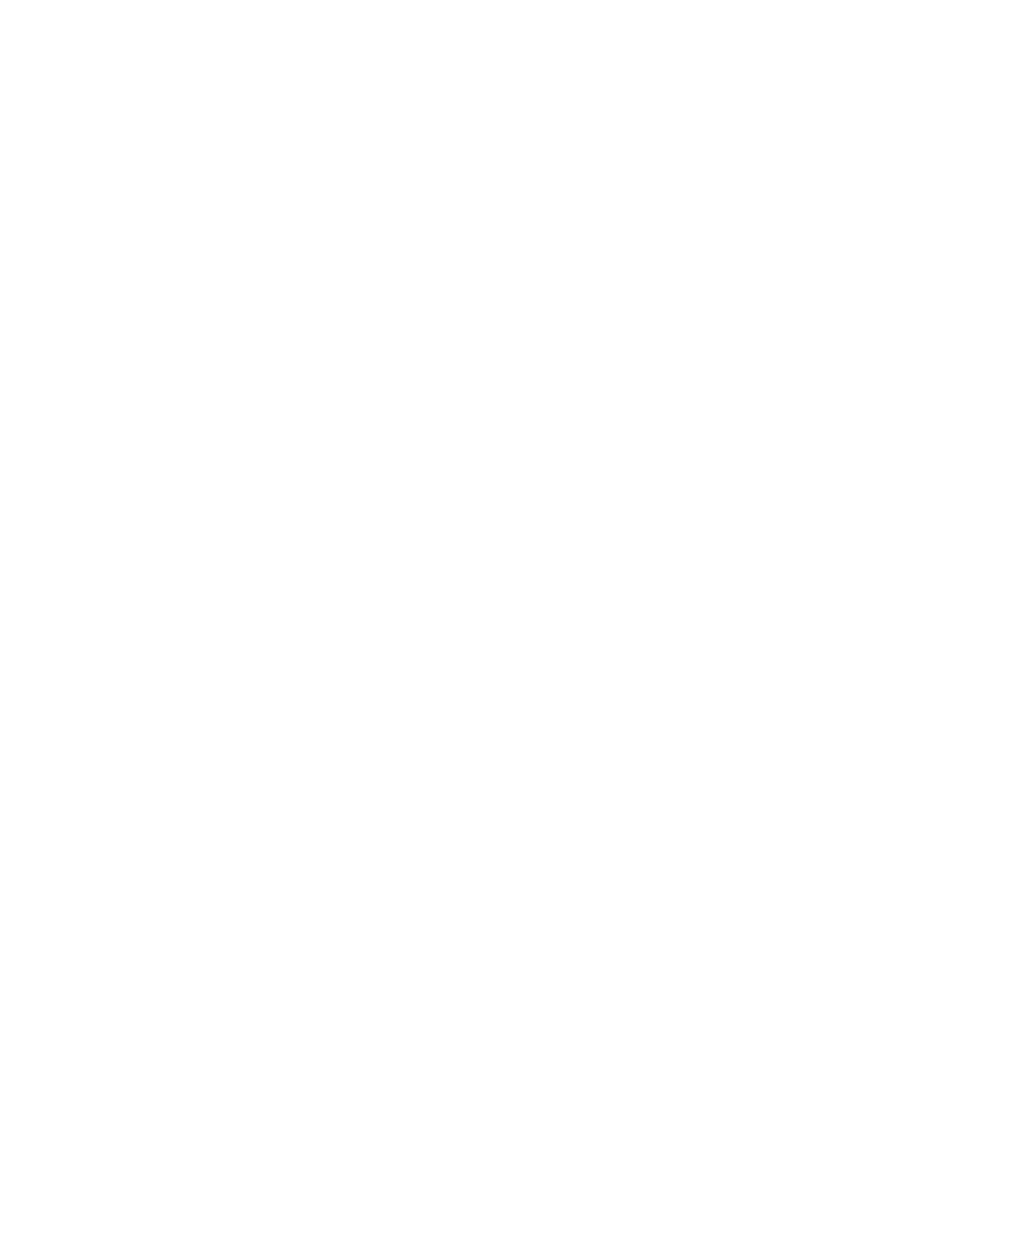 gipfelfamilie